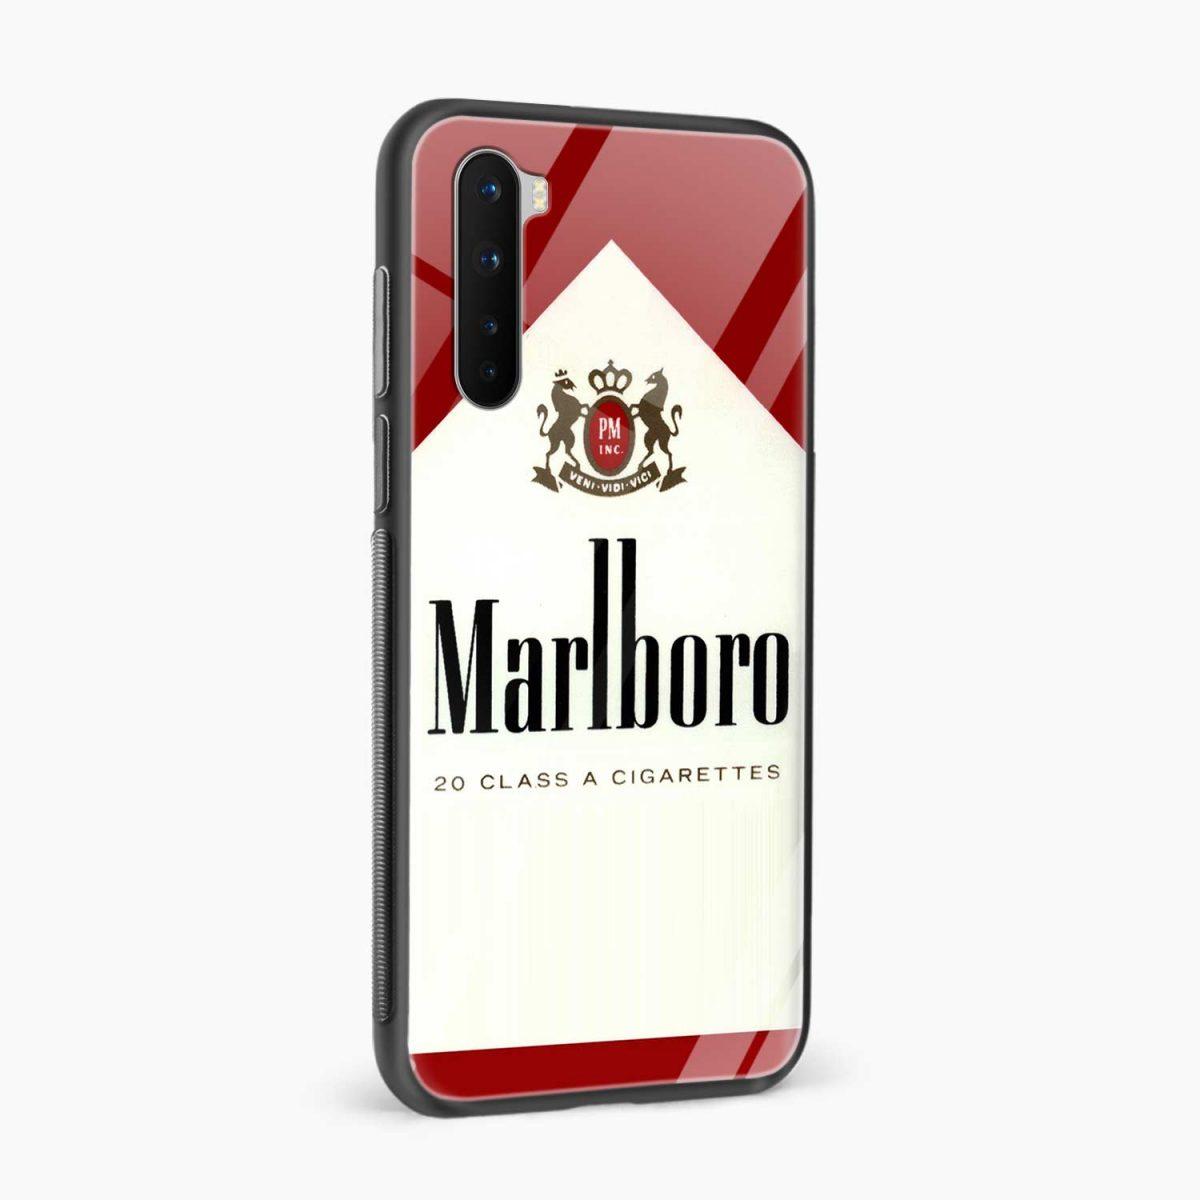 marlboro cigarette box side view oneplus nord back cover